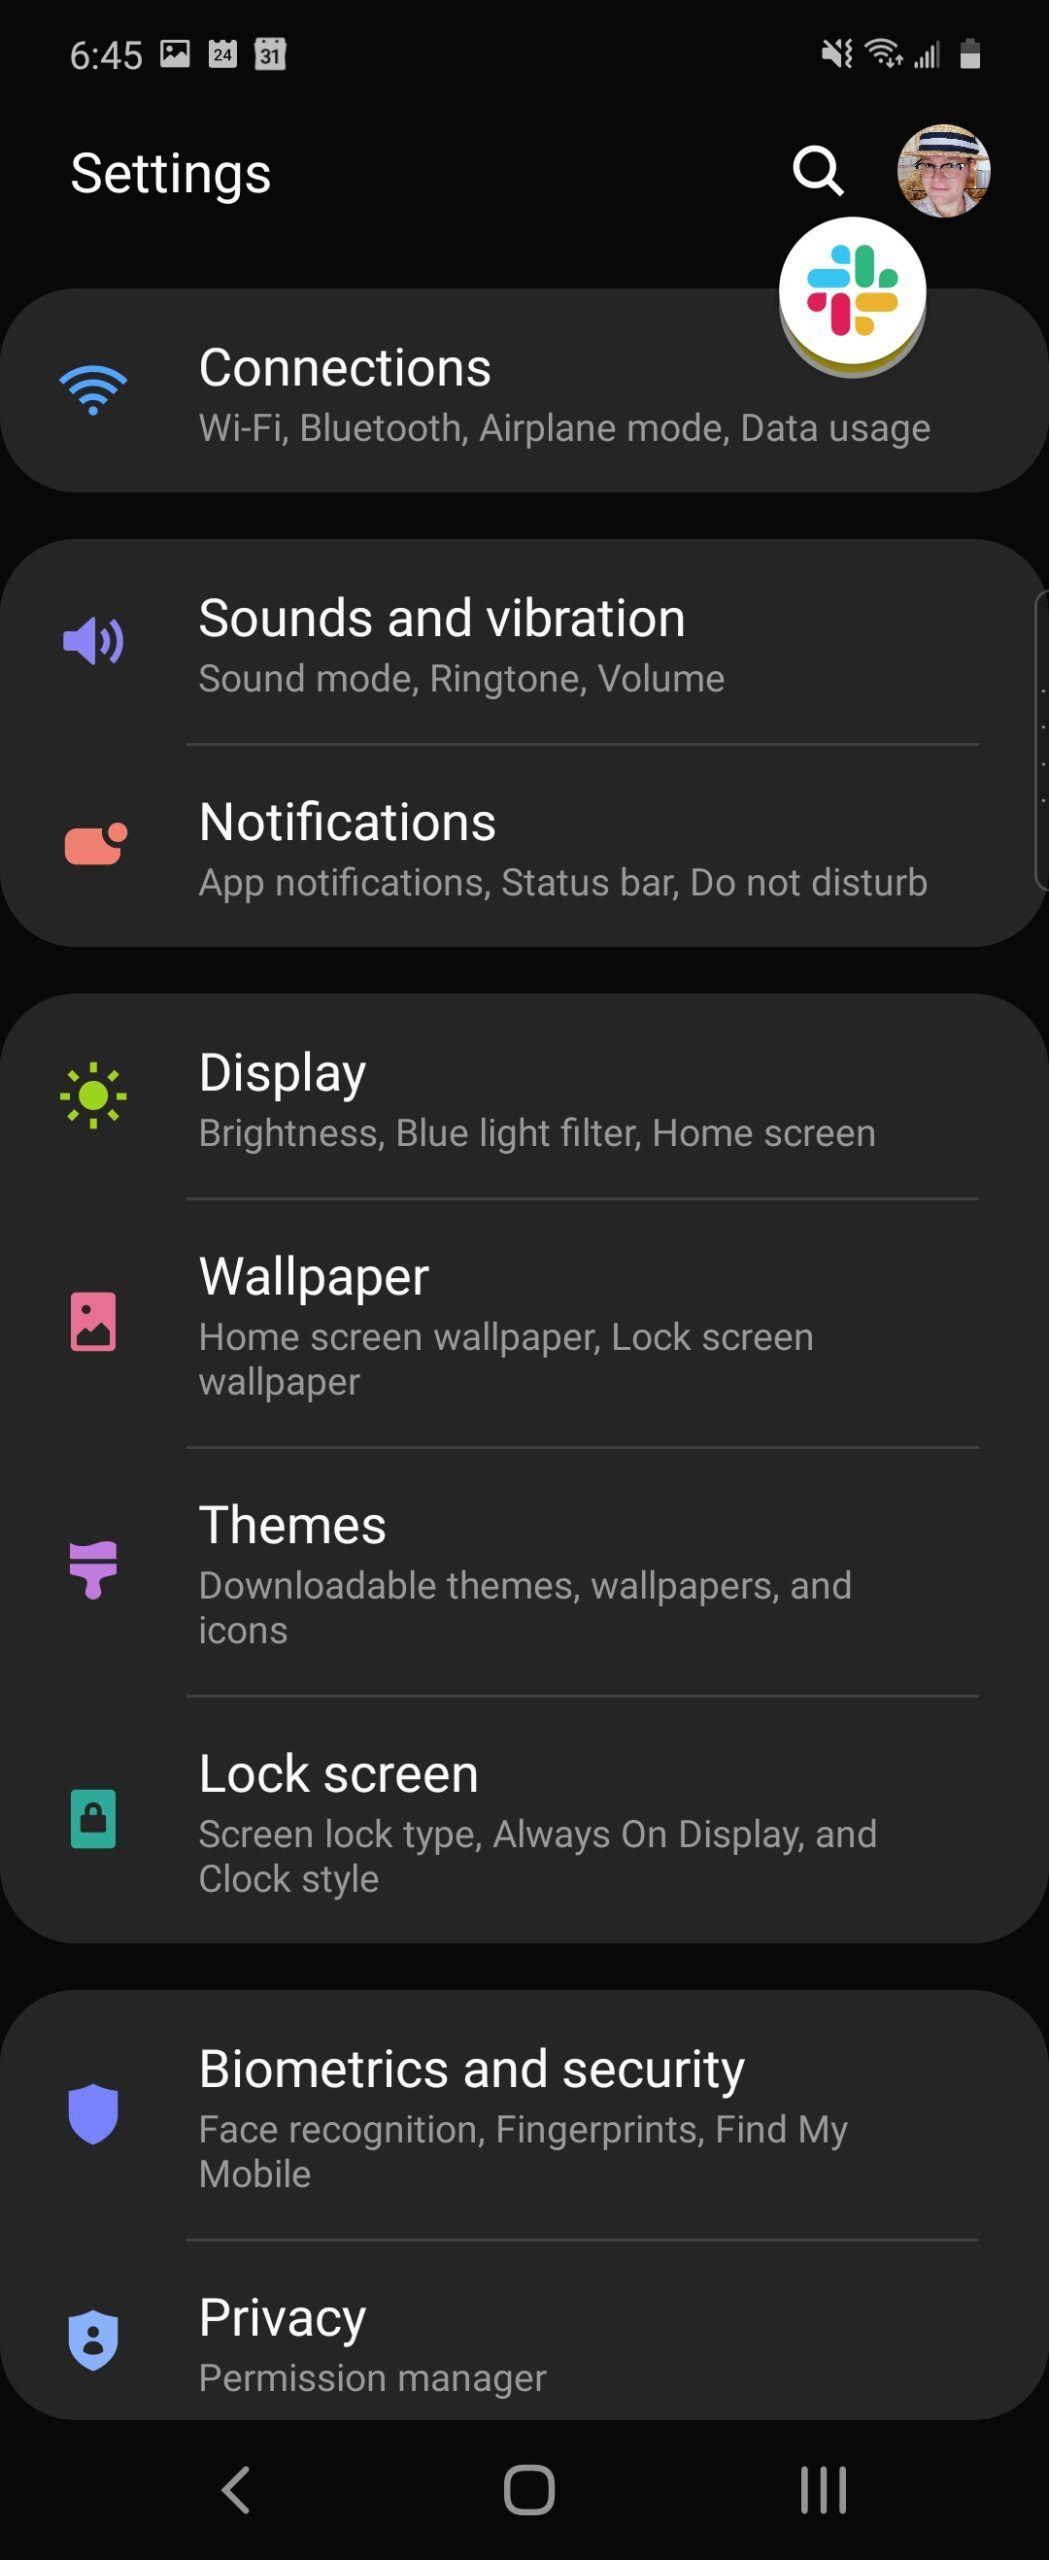 Galaxy Z Flip software screenshot 3.